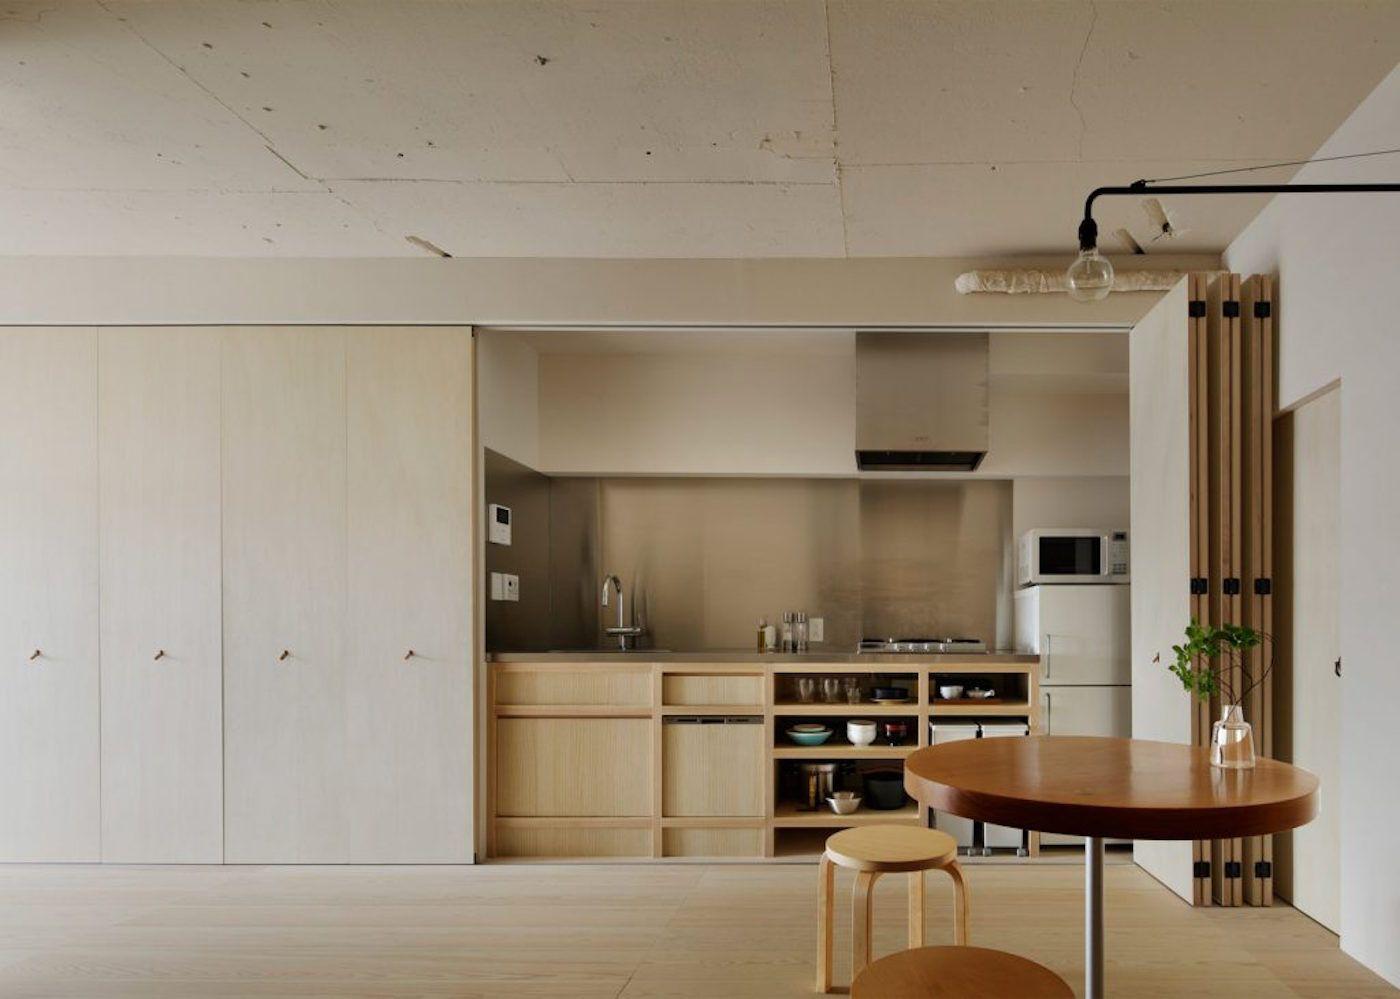 apartment in kitasando interior design kitchen apartment interior hidden kitchen on kitchen interior japan id=39404